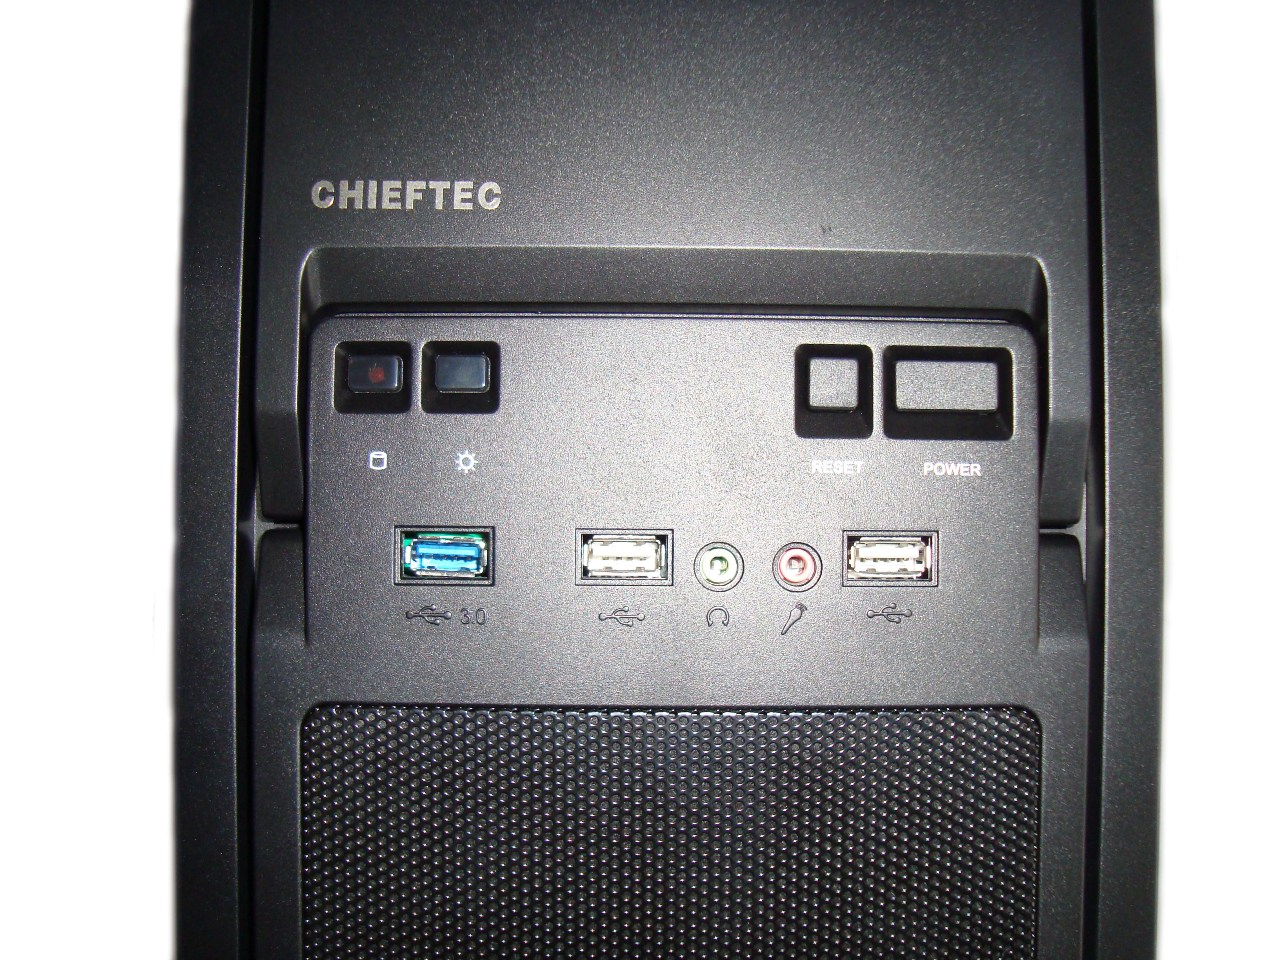 Chieftec LIBRA LF-02B - front panel